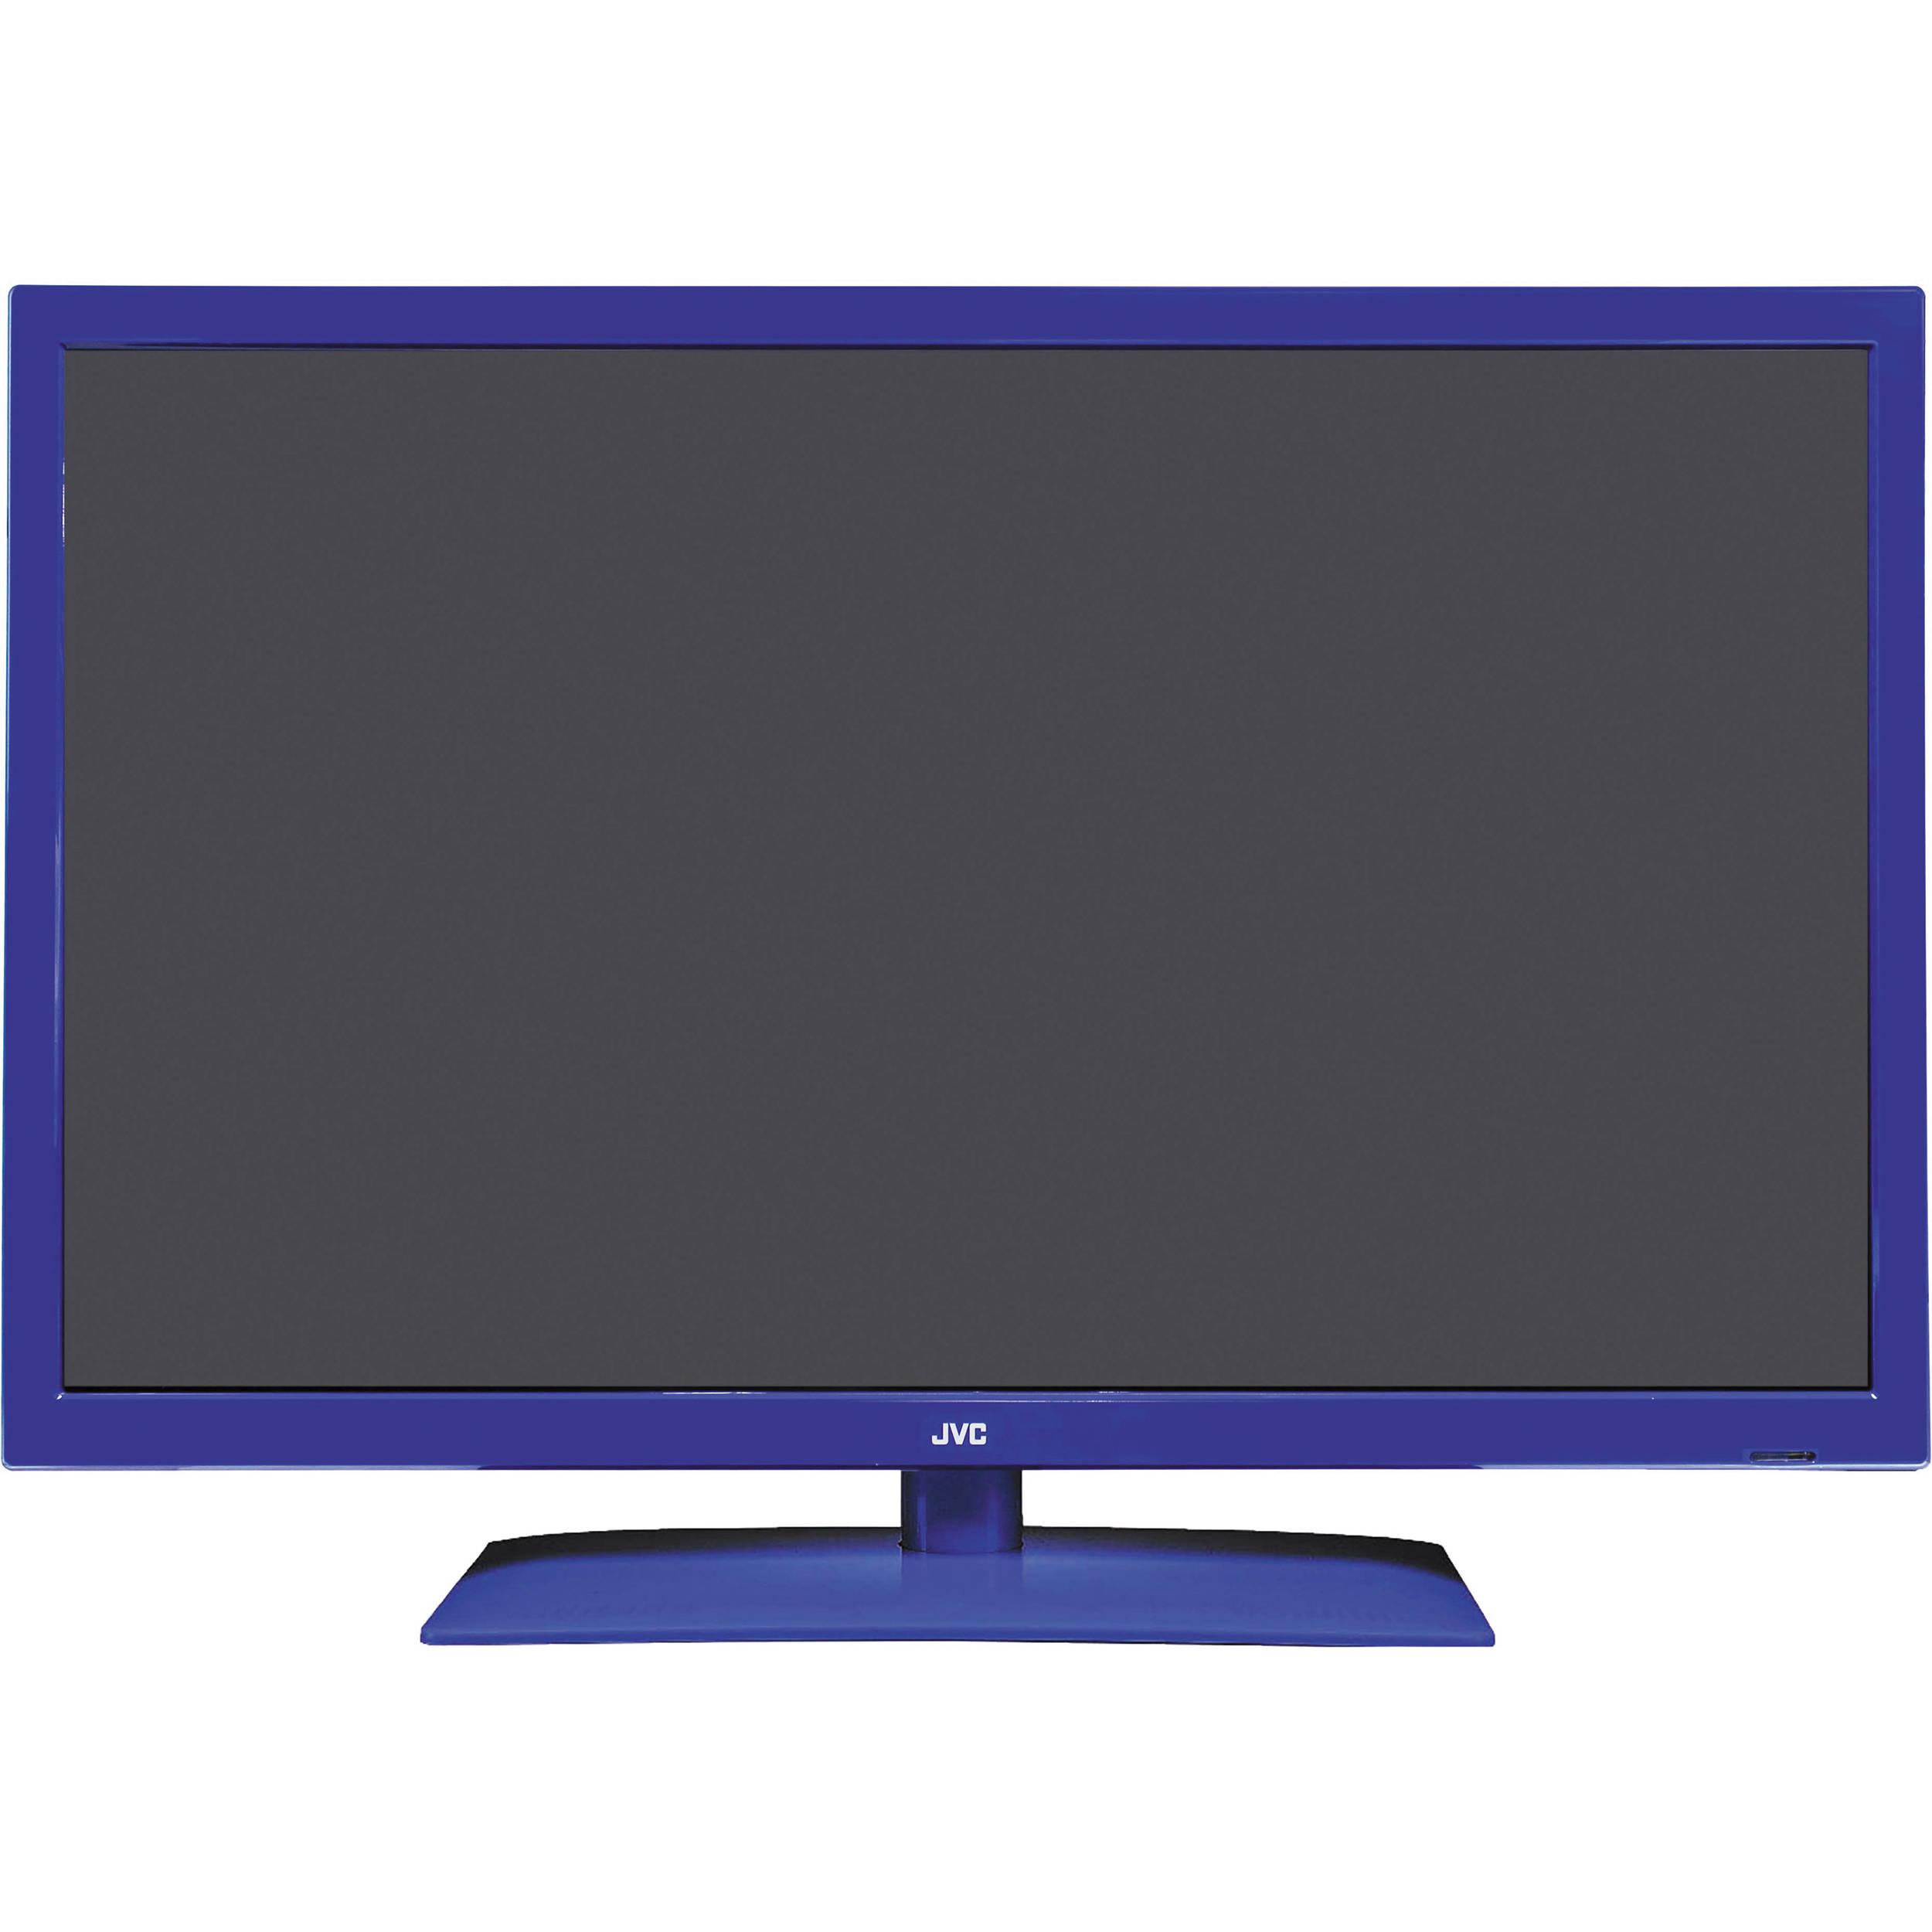 jvc tv related keywords suggestions jvc tv long tail keywords. Black Bedroom Furniture Sets. Home Design Ideas